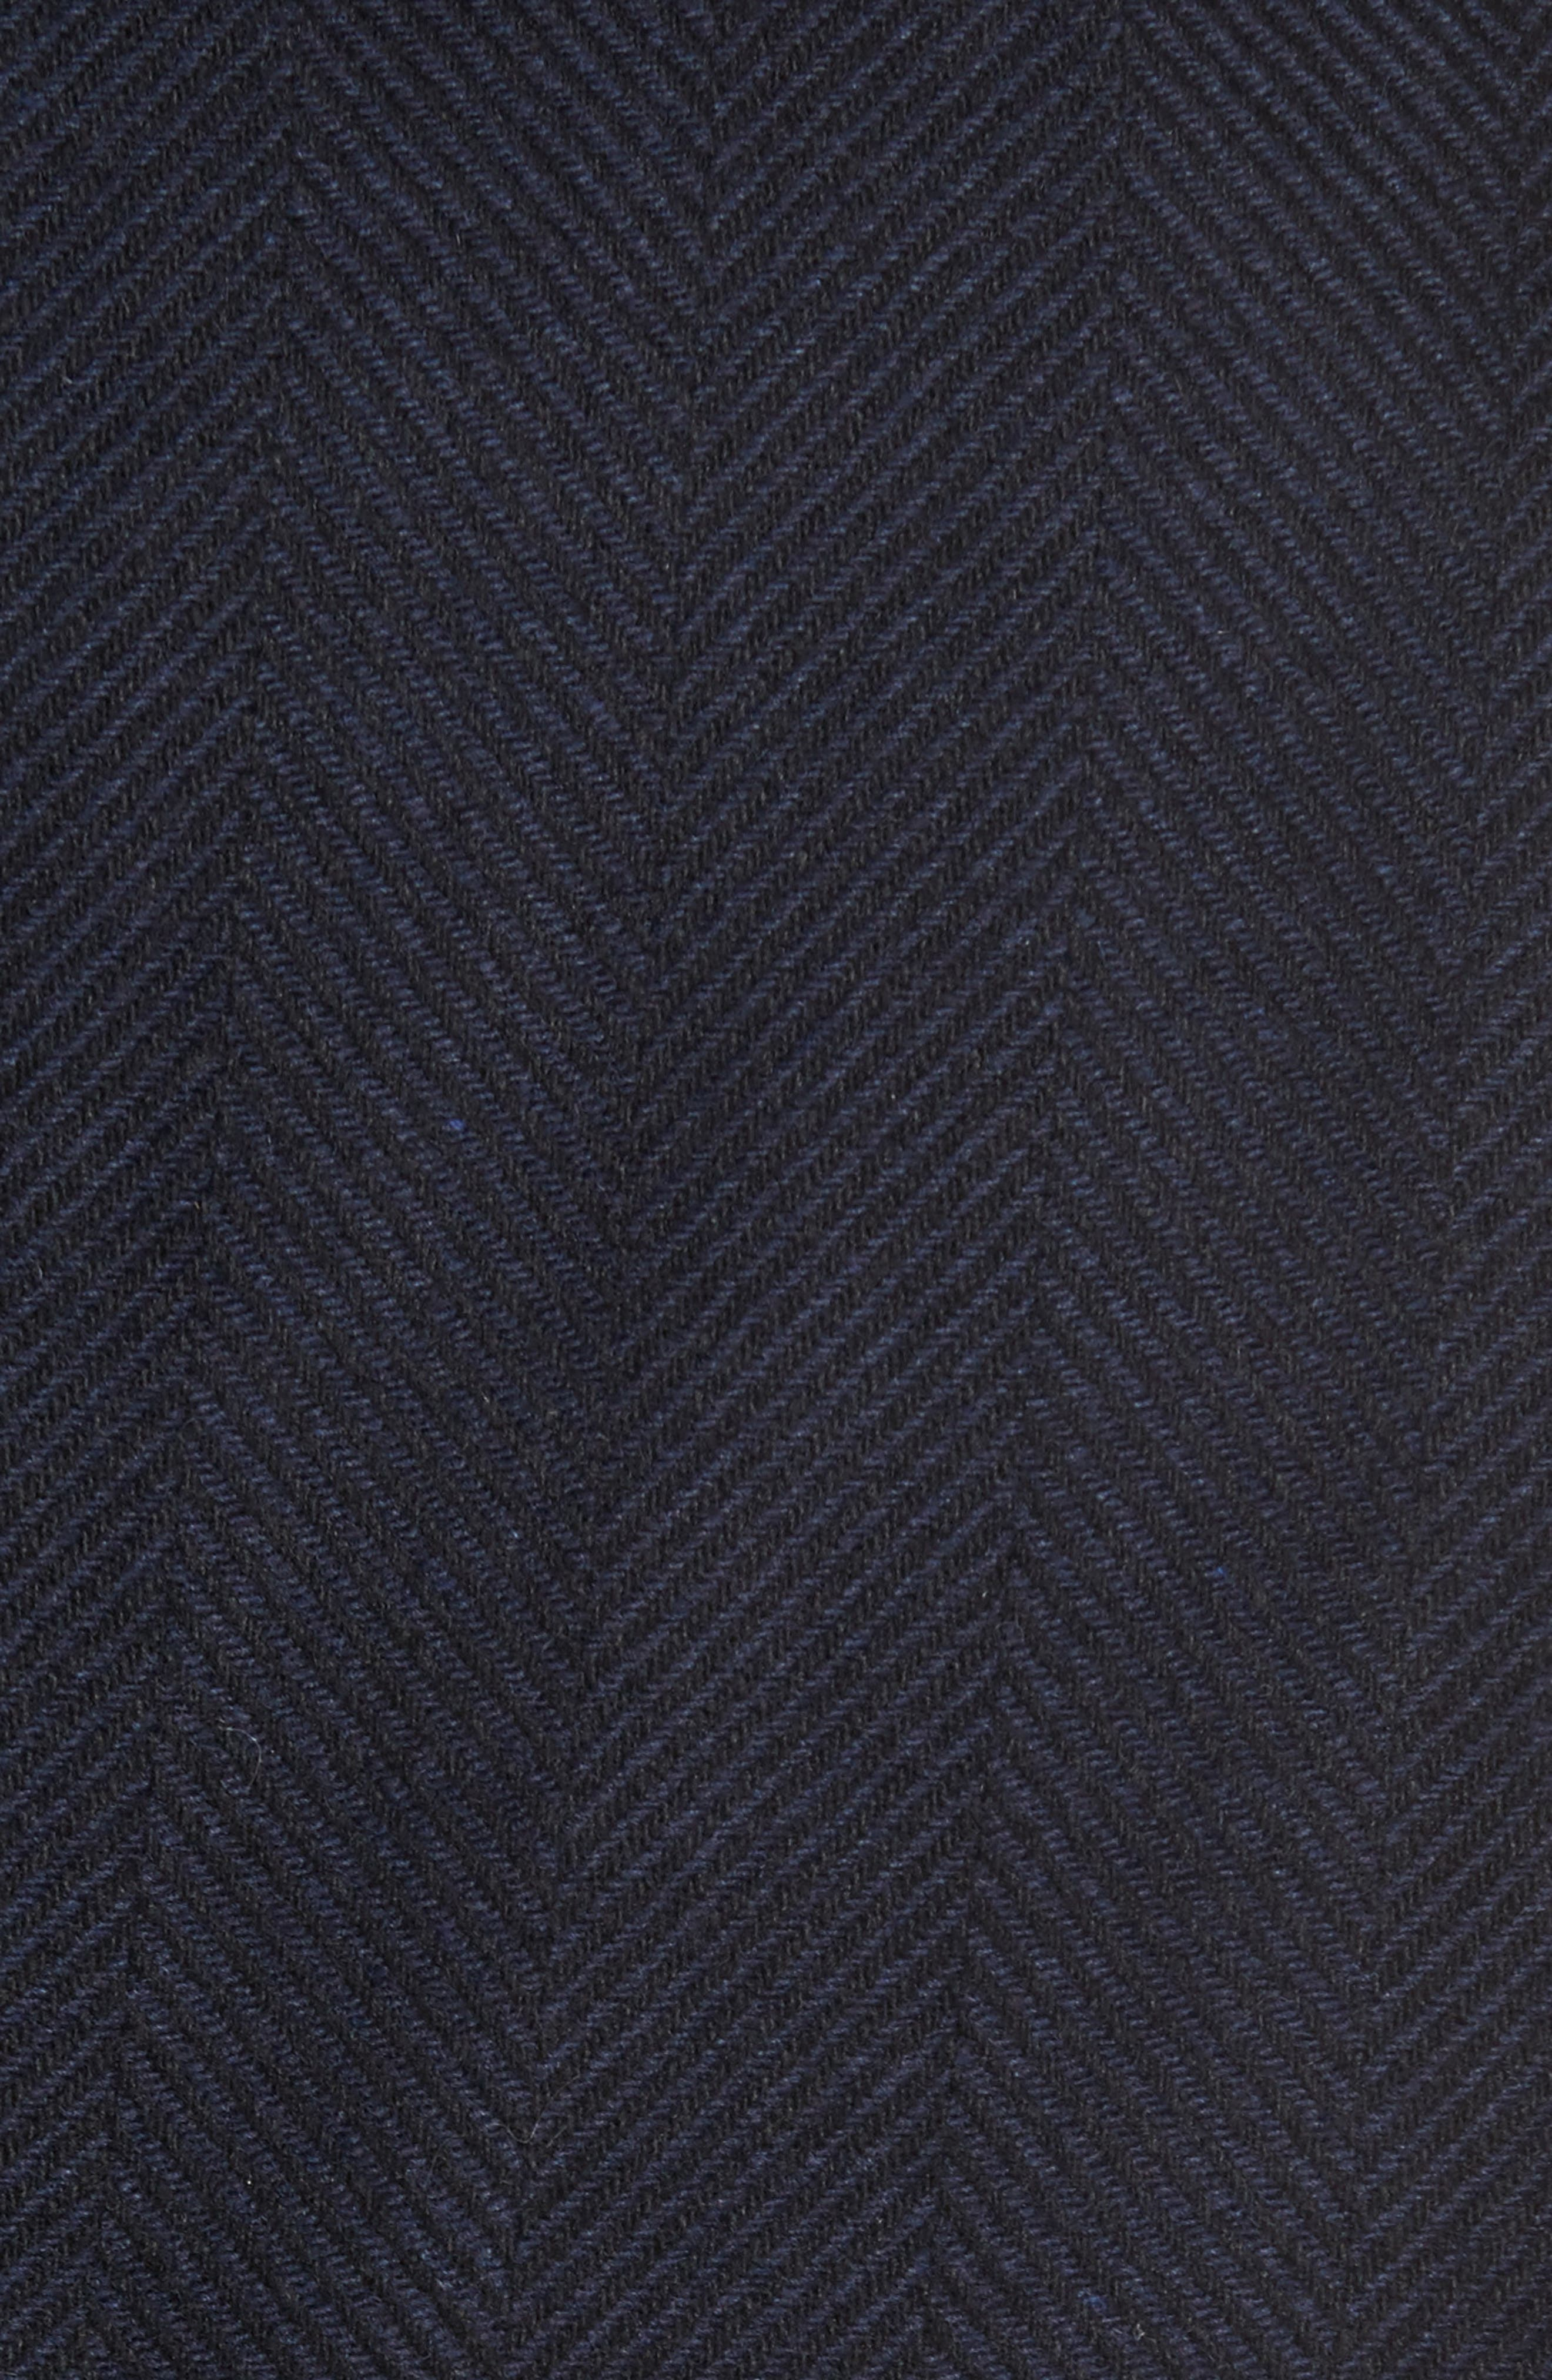 Bower Herringbone Wool Blend Topcoat,                             Alternate thumbnail 5, color,                             Liberty Multi